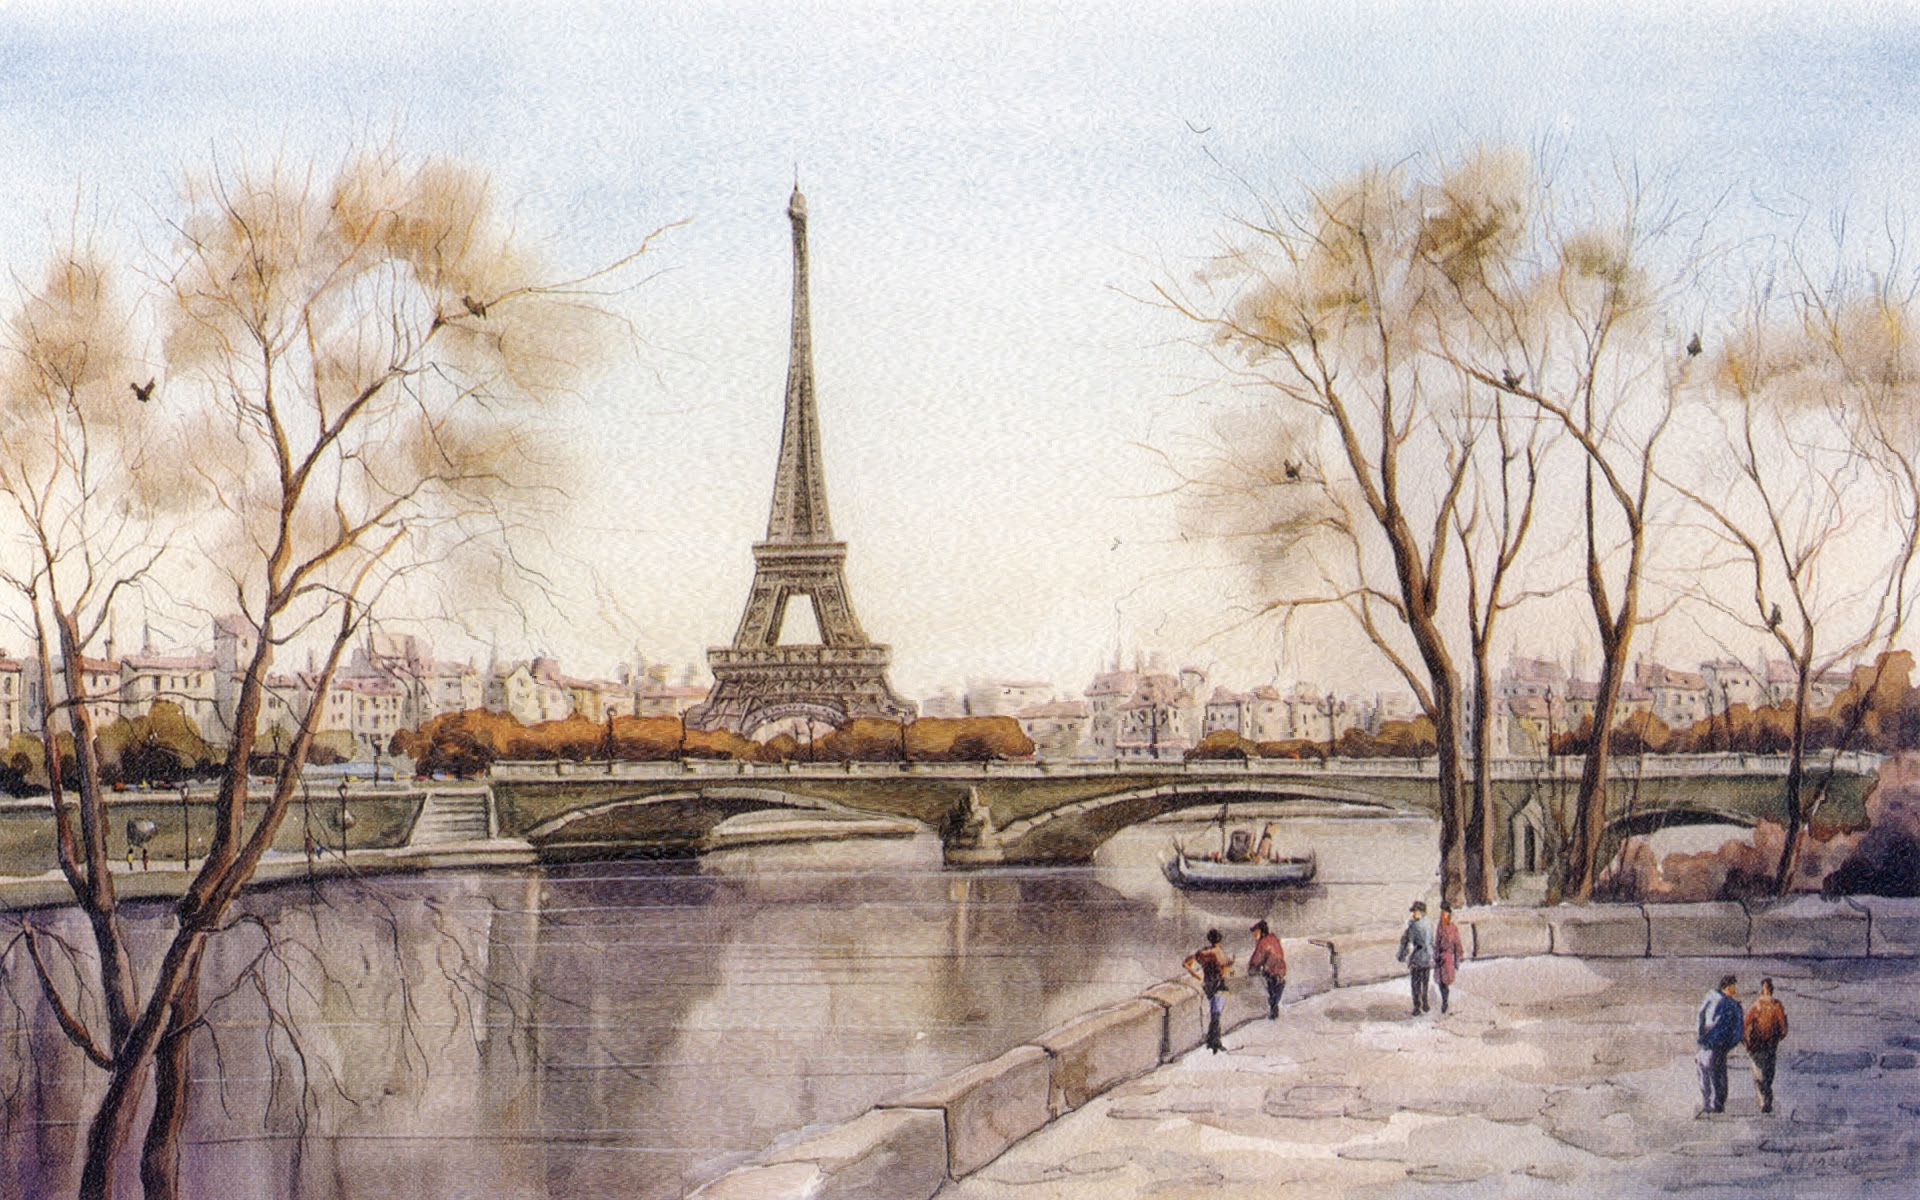 1920x1200 paris landscape drawing wallpaper france drawing bridge eiffel